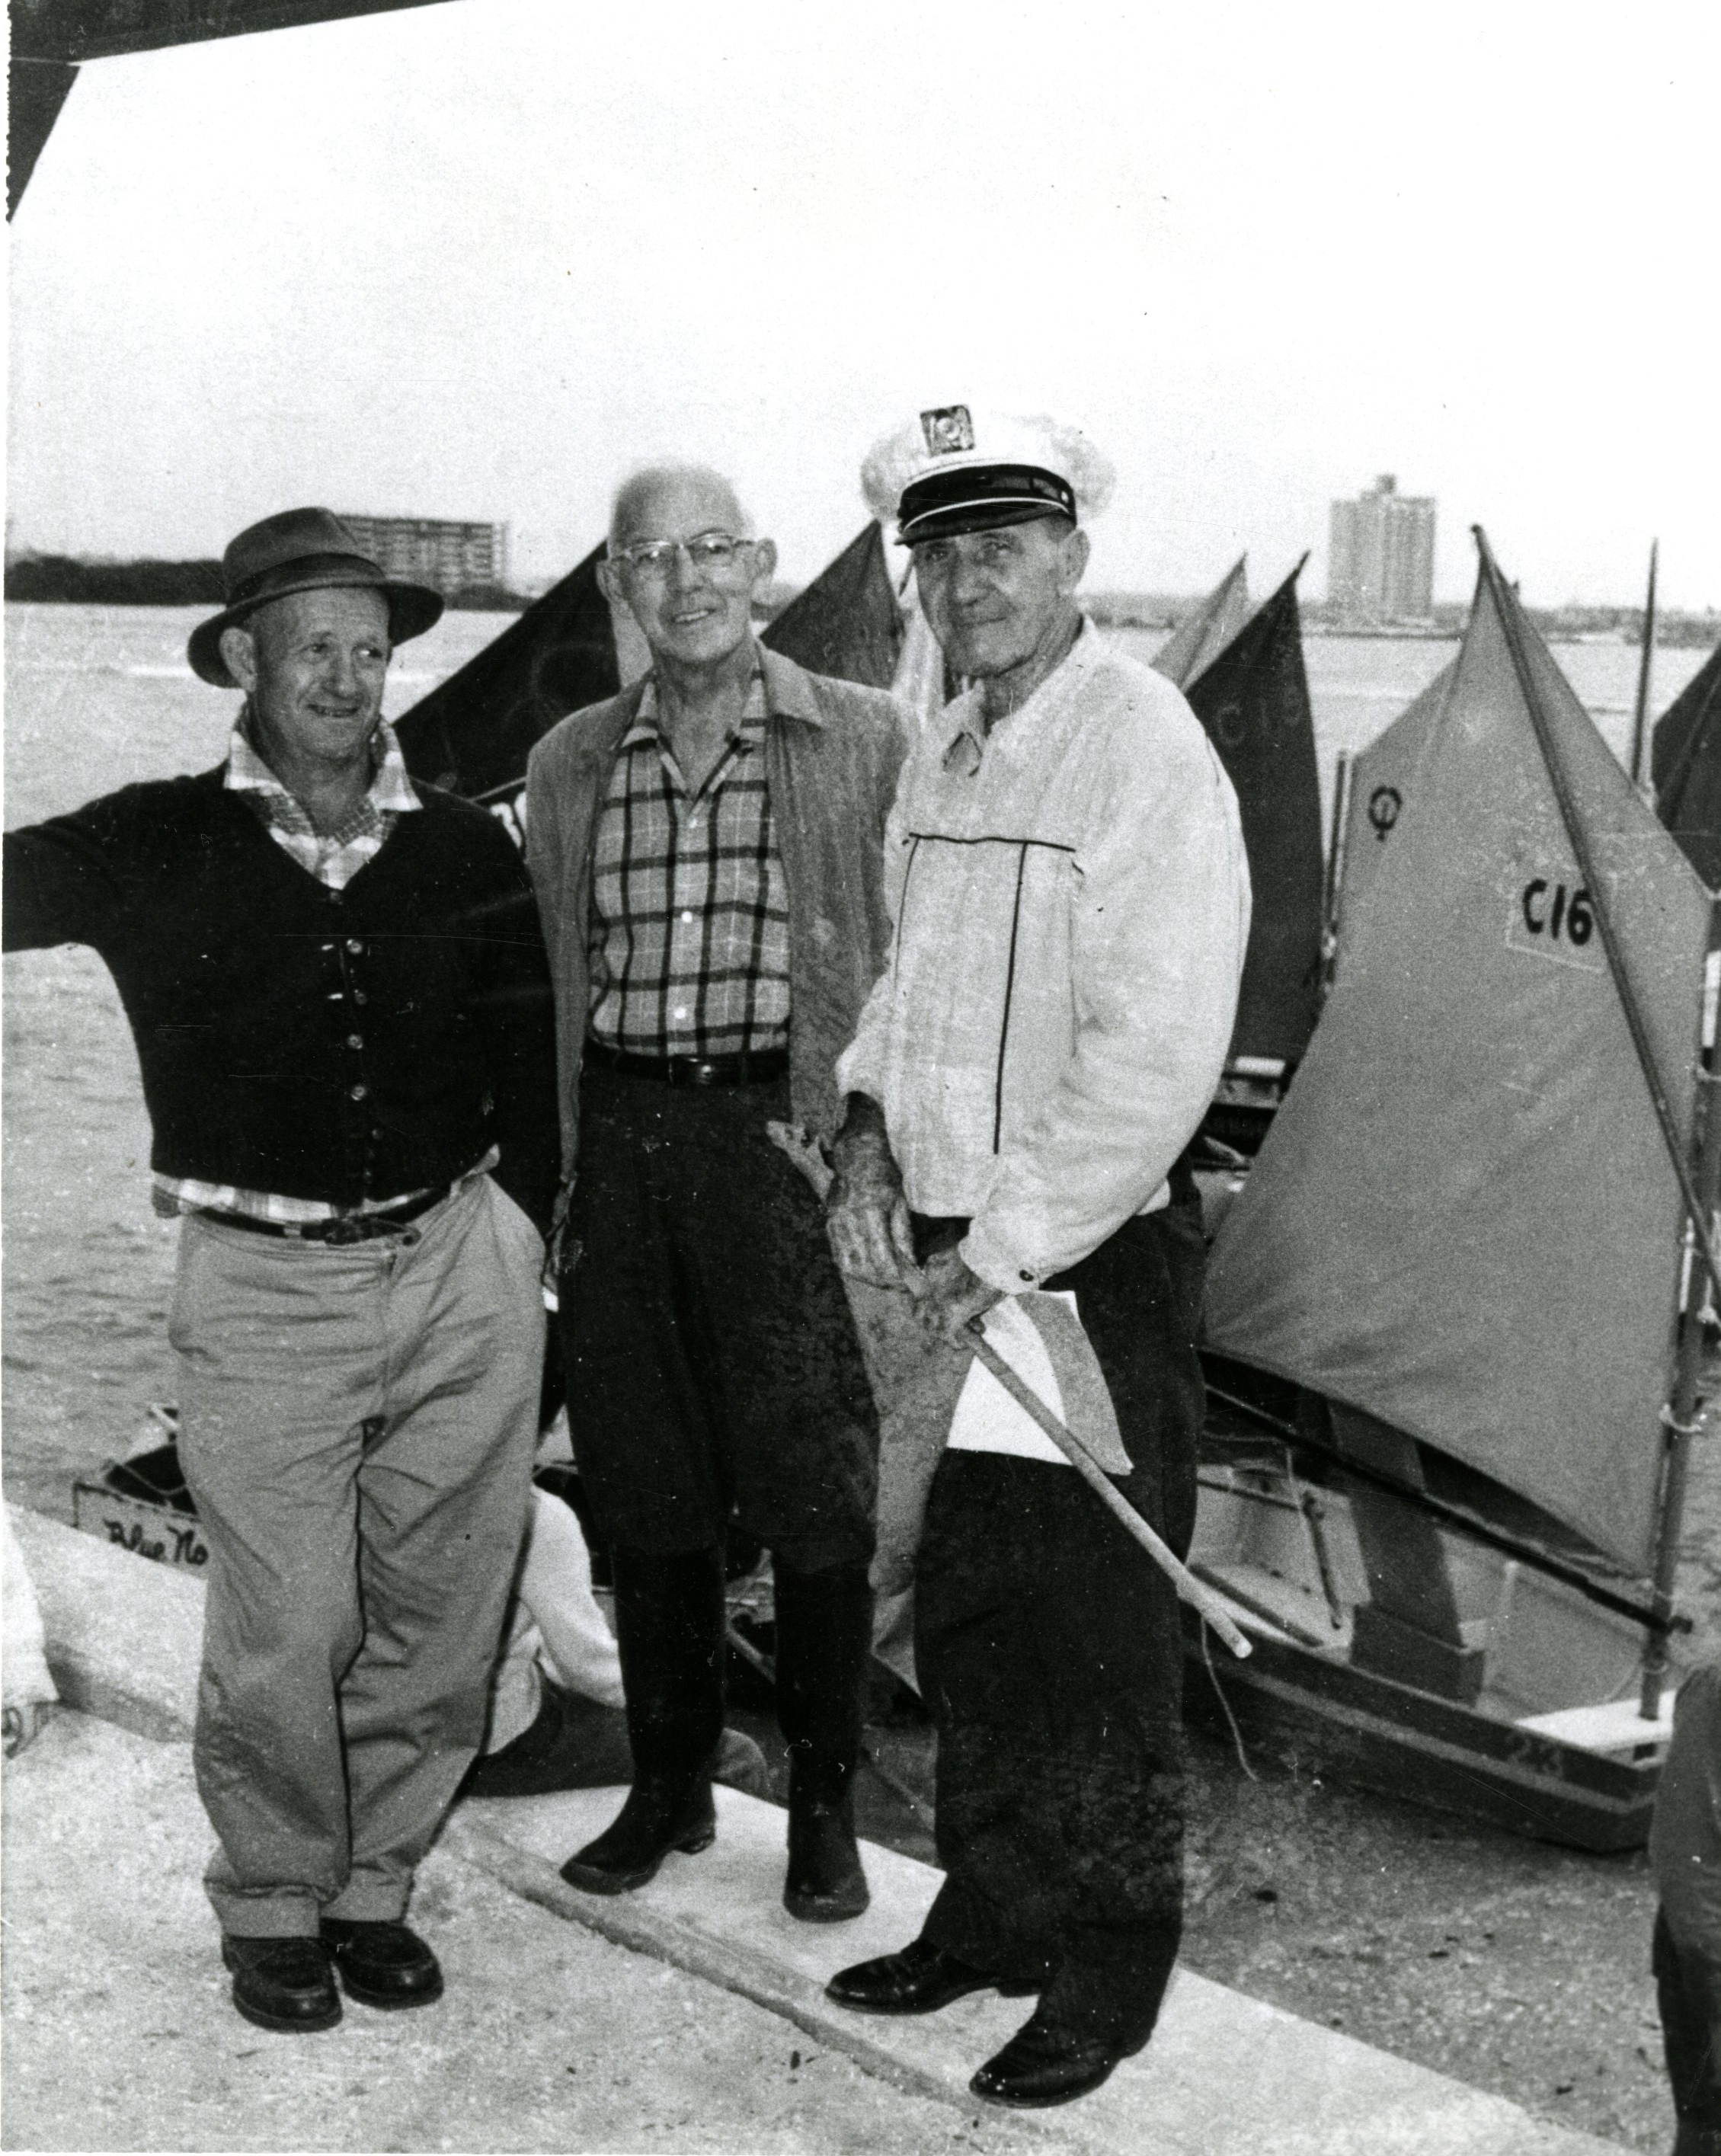 Clark E. Mills, Clifford McKay, and fleet captain Ernie Breen, Clearwater, Florida, circa 1948.